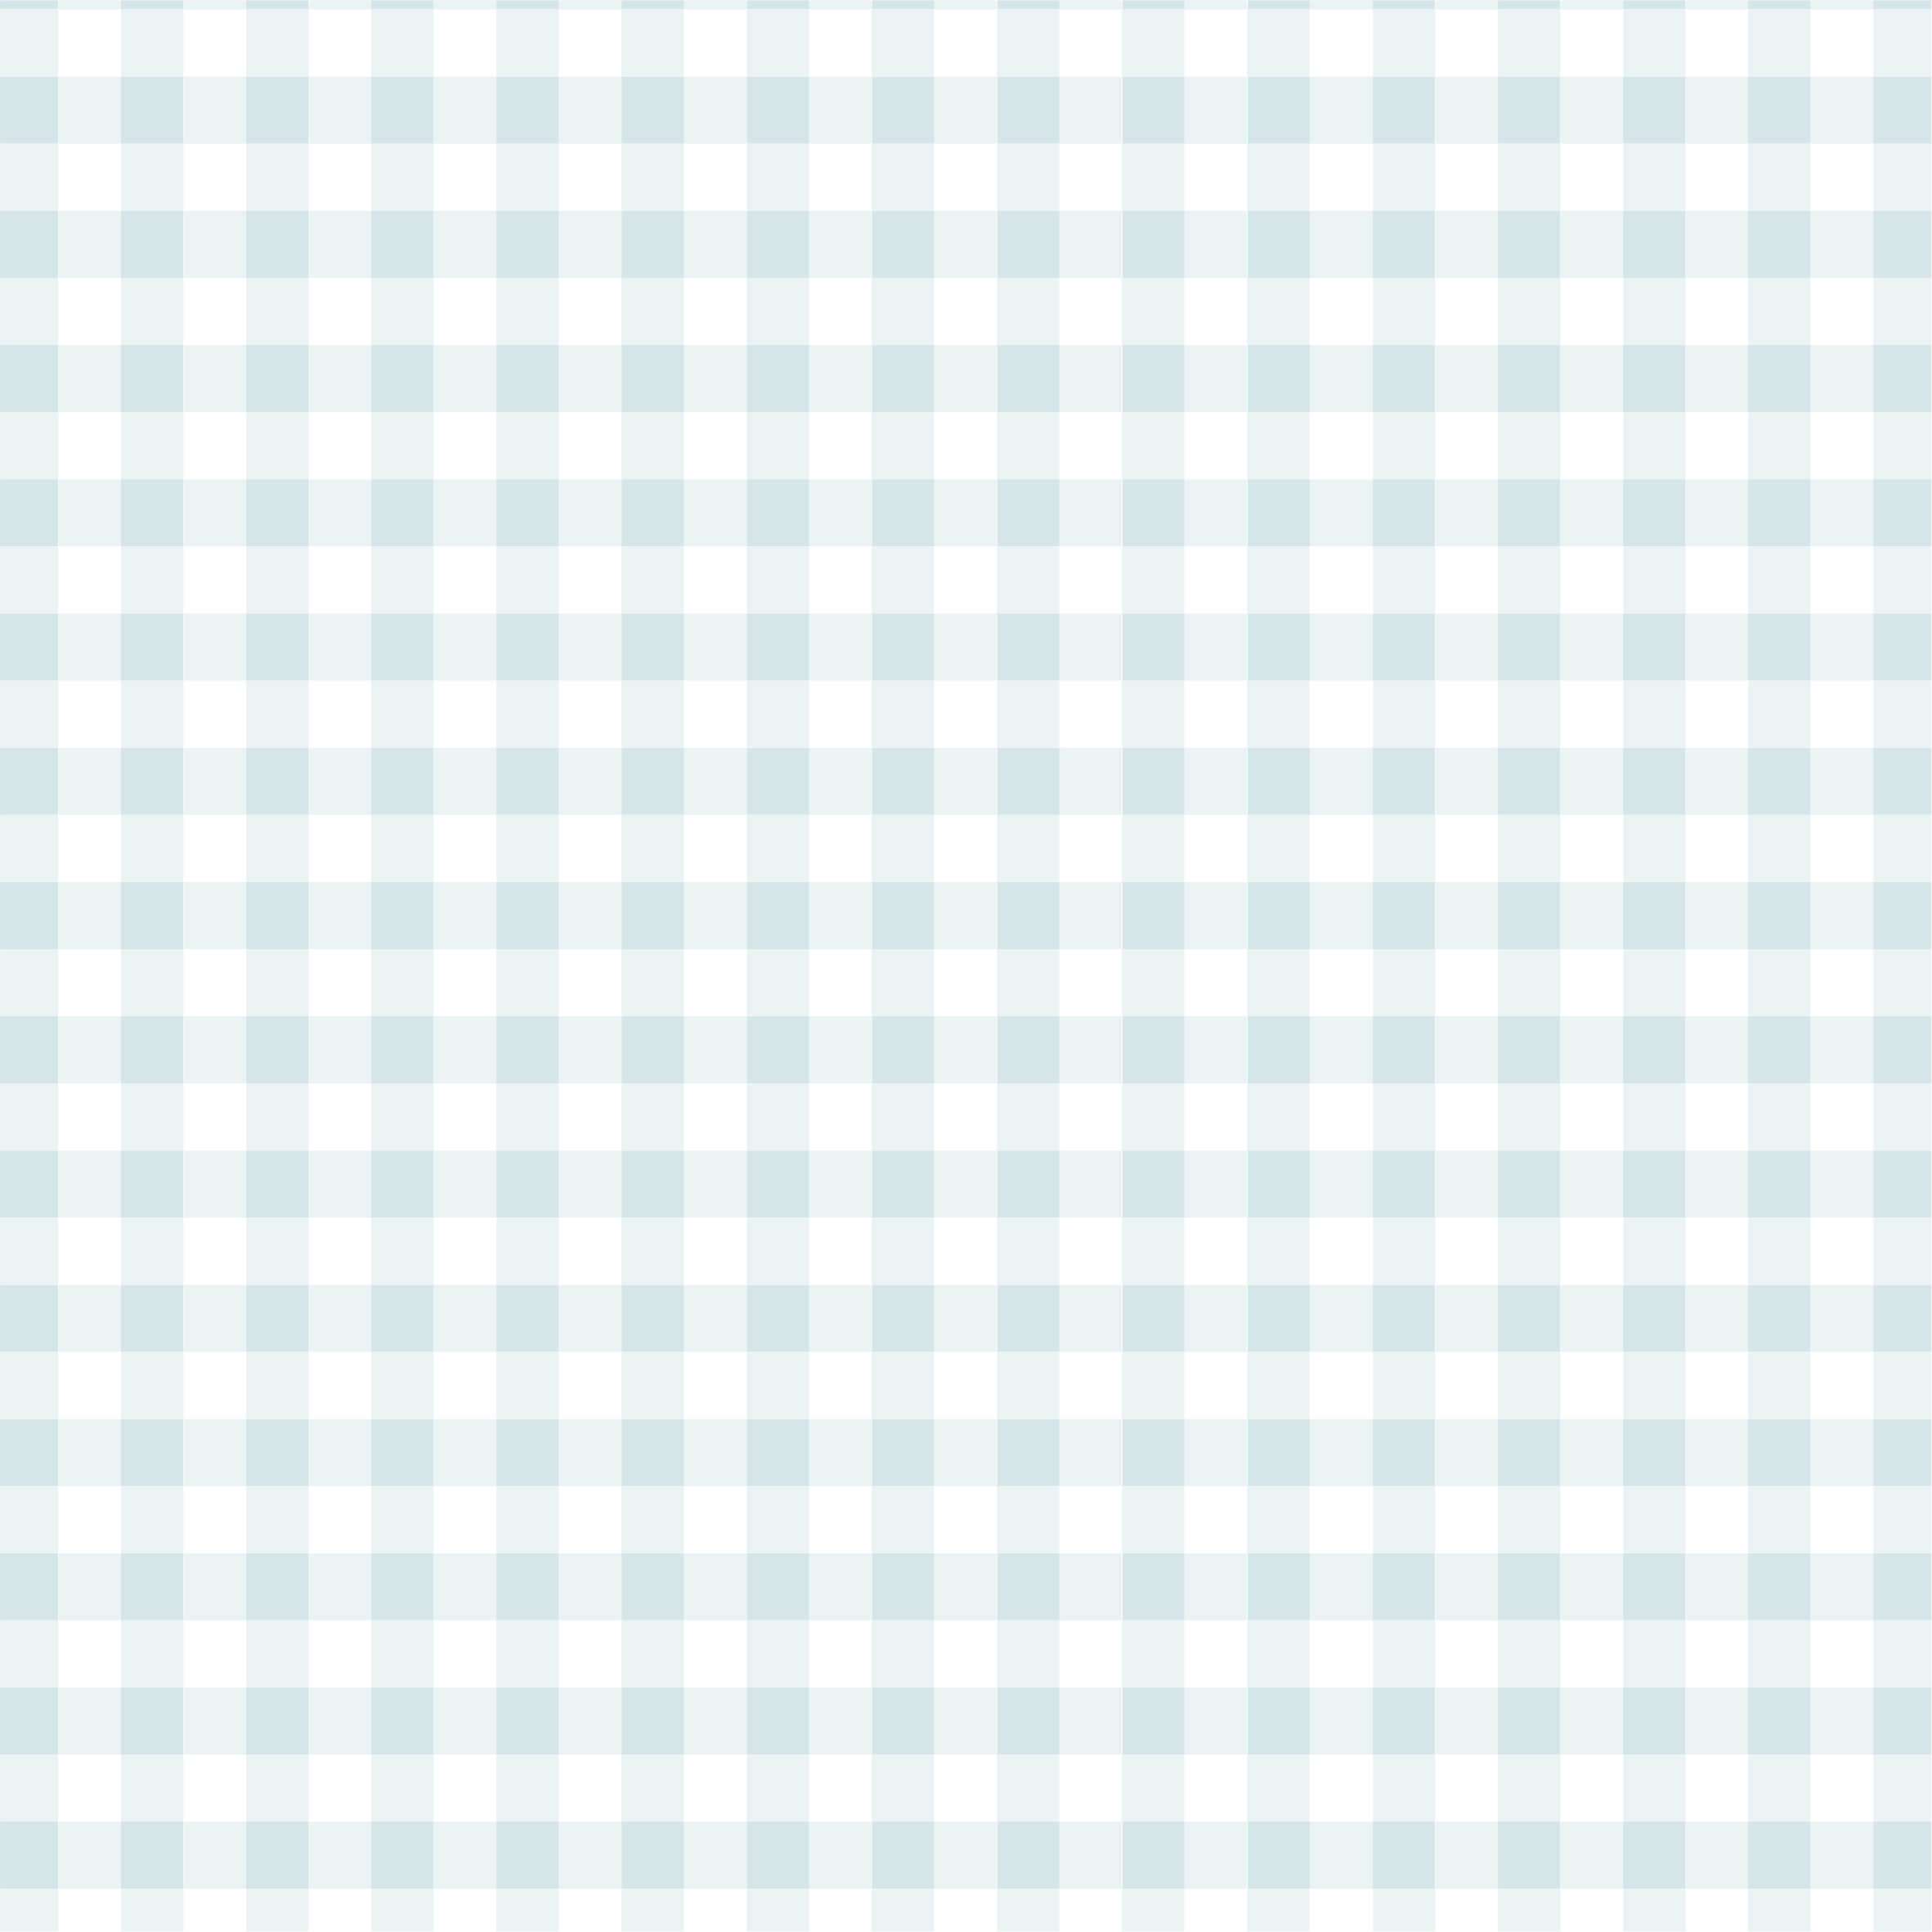 Aparador Branco Para Quarto De Bebe ~ Tecido Adesivo Xadrez Big Azul Beb u00ea Stick Home Adesivos Decorativos Elo7